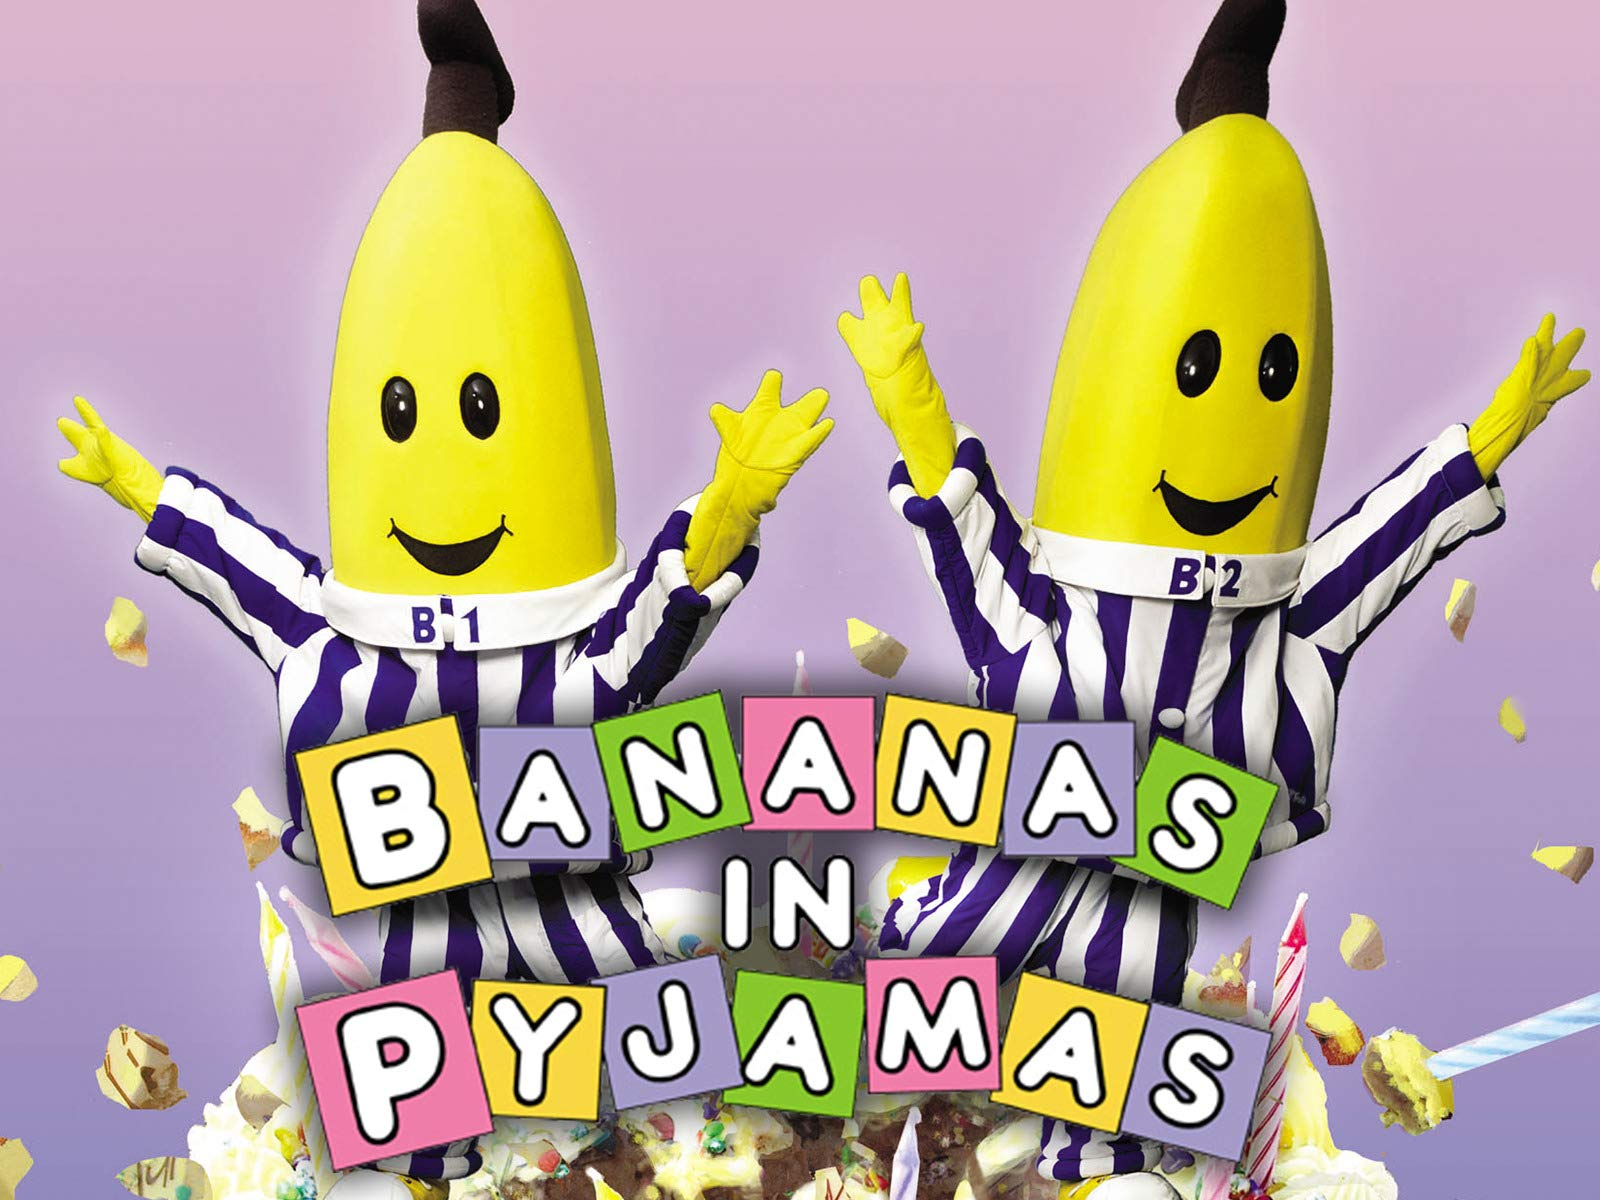 Watch Bananas In Pyjamas Live Action Prime Video